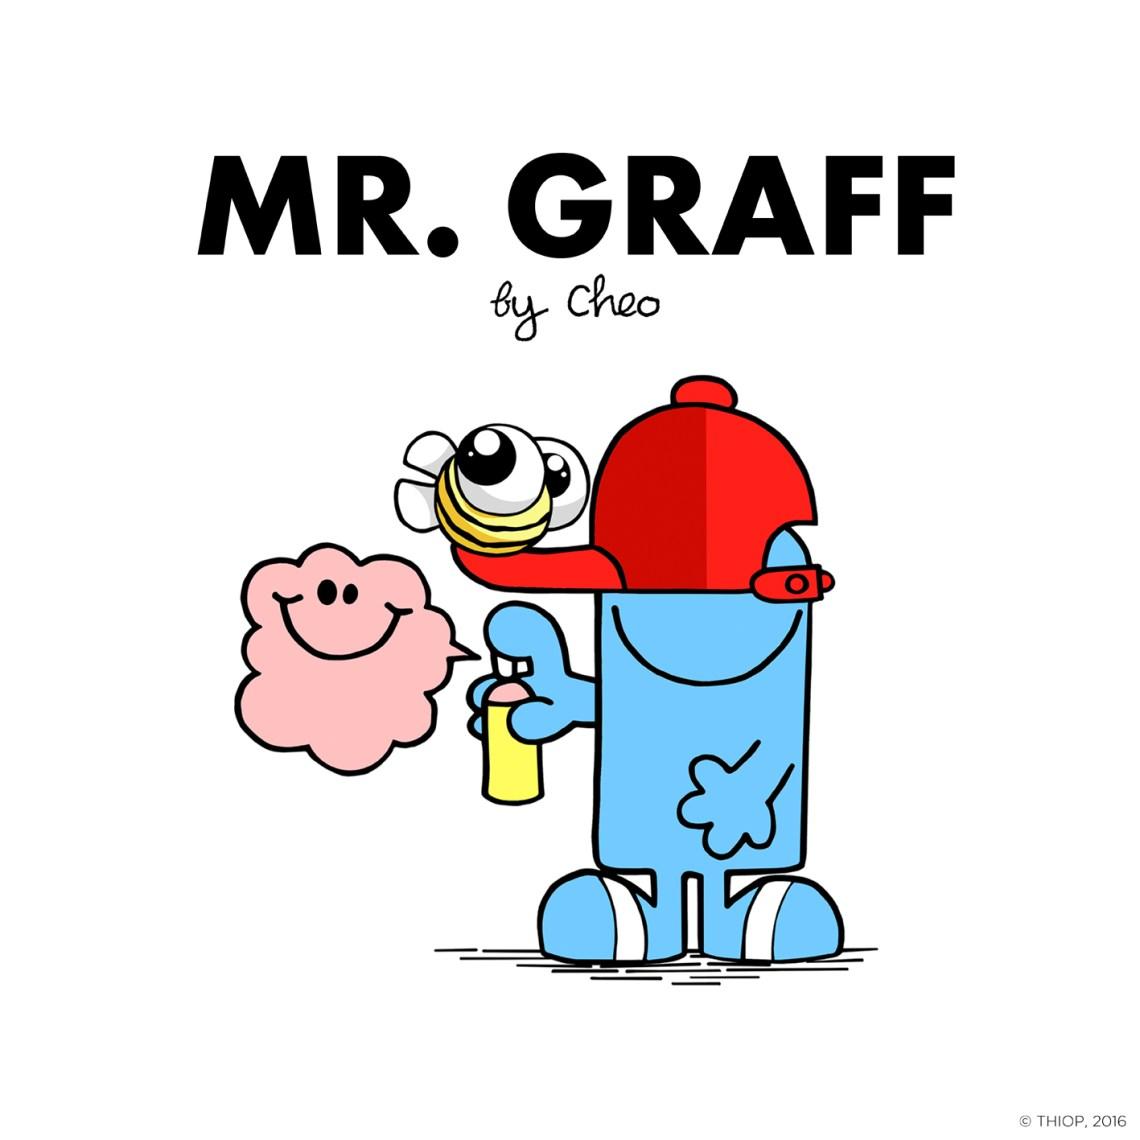 Introducing Mr Graff